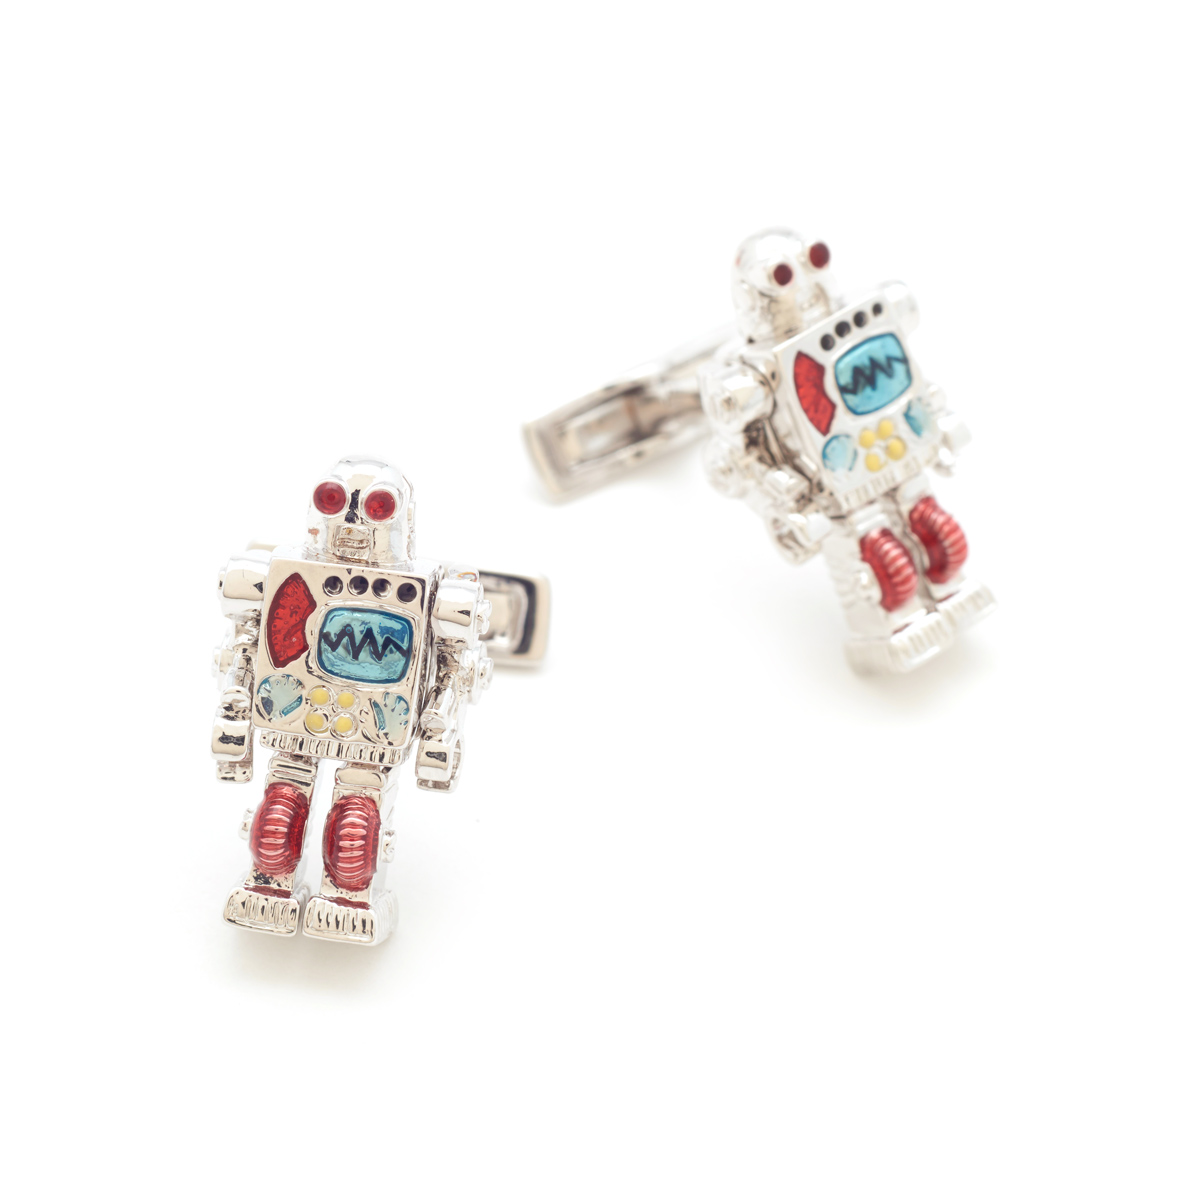 Robot Cufflinks by Bill Skinner